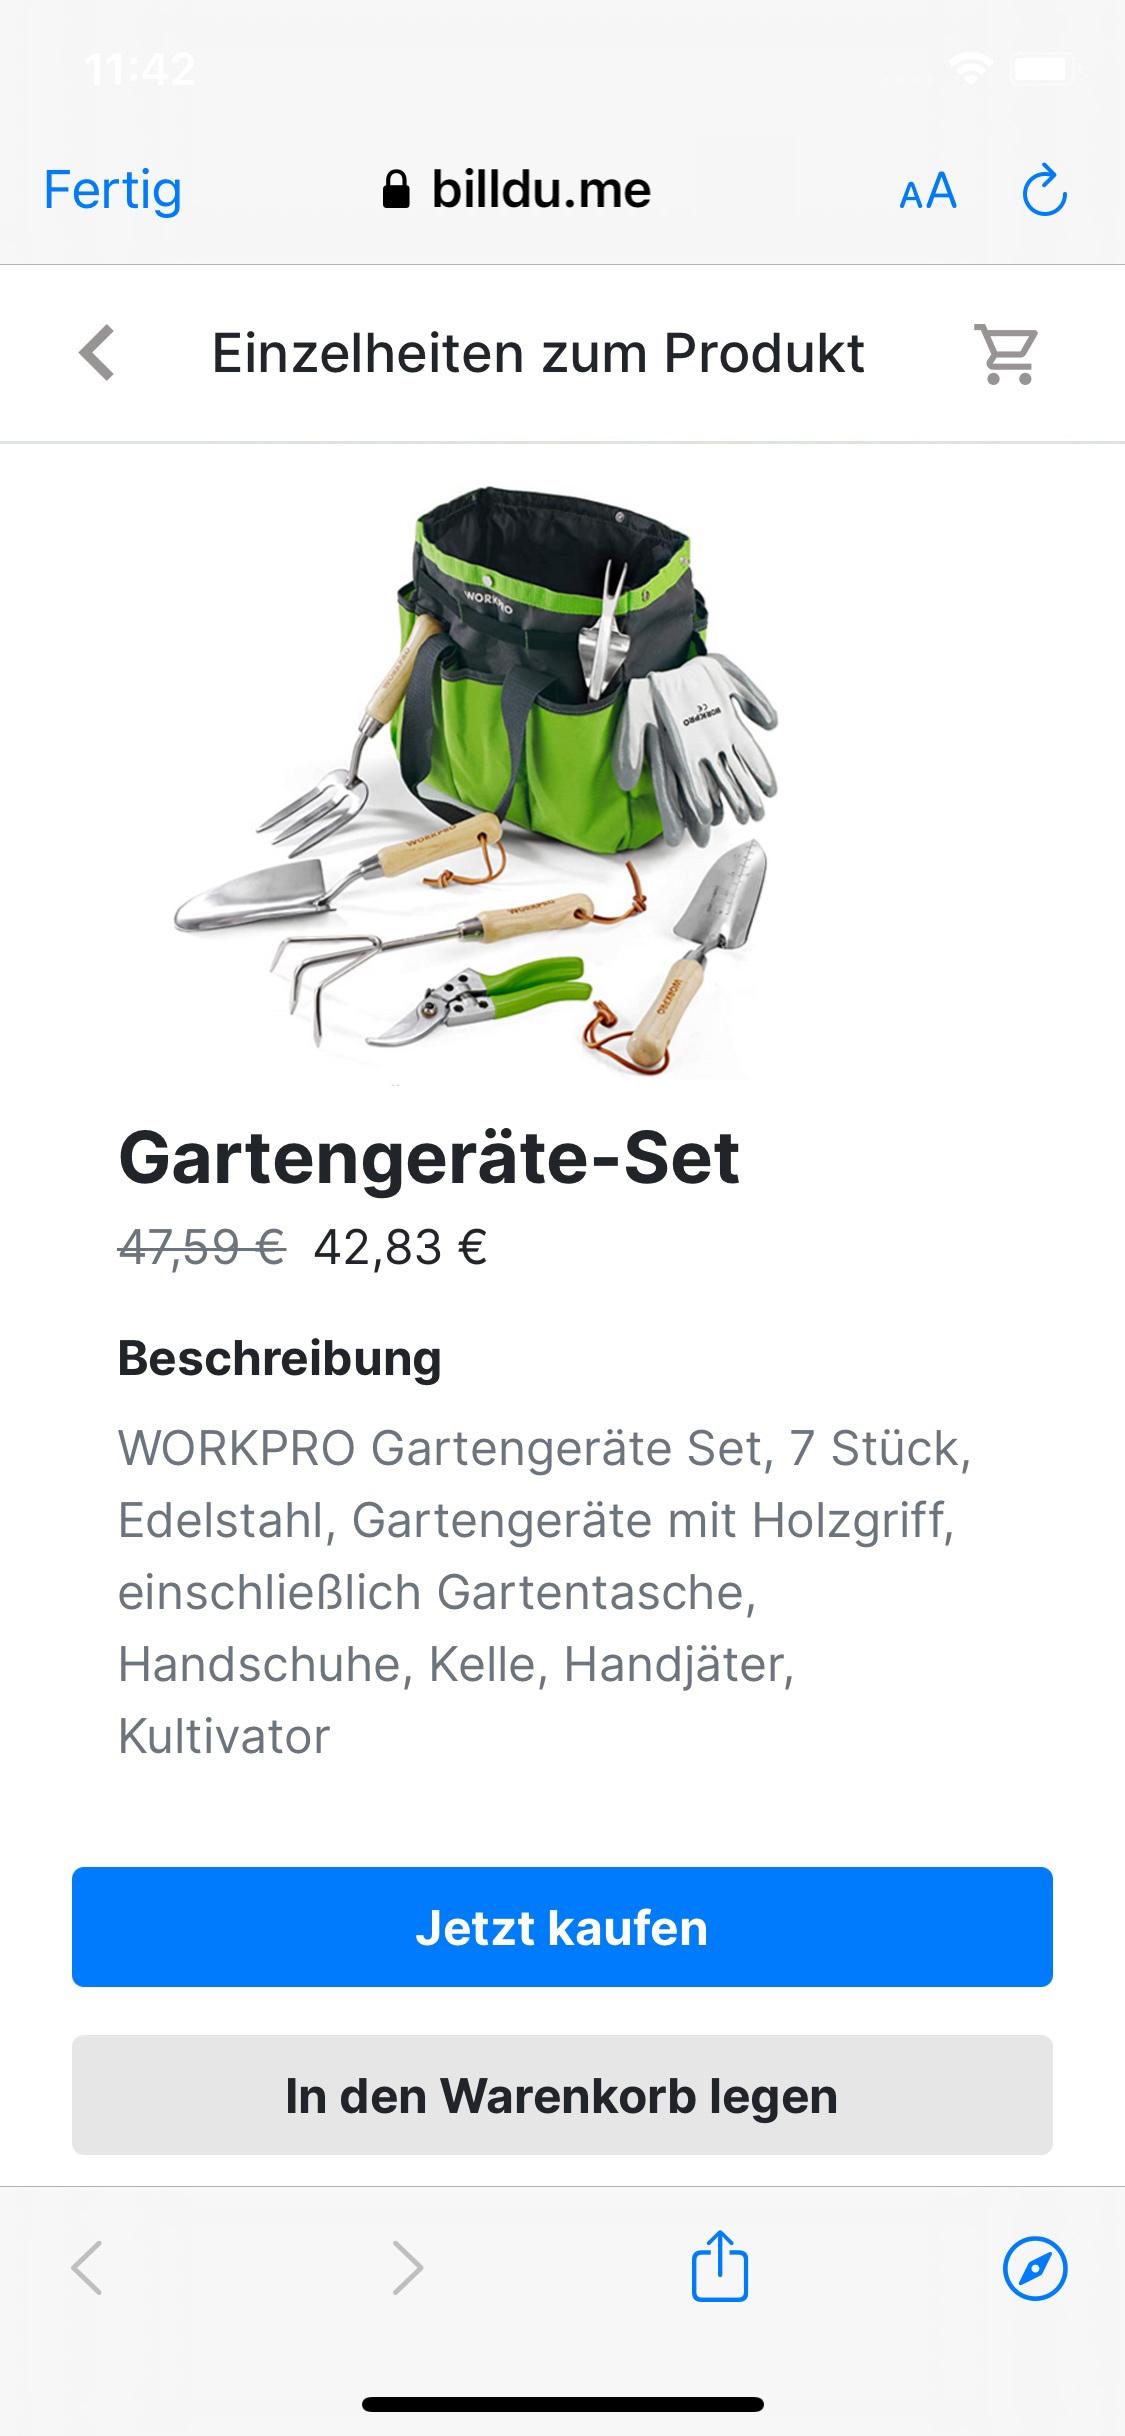 rechnnugsapp_online shop product _tool1